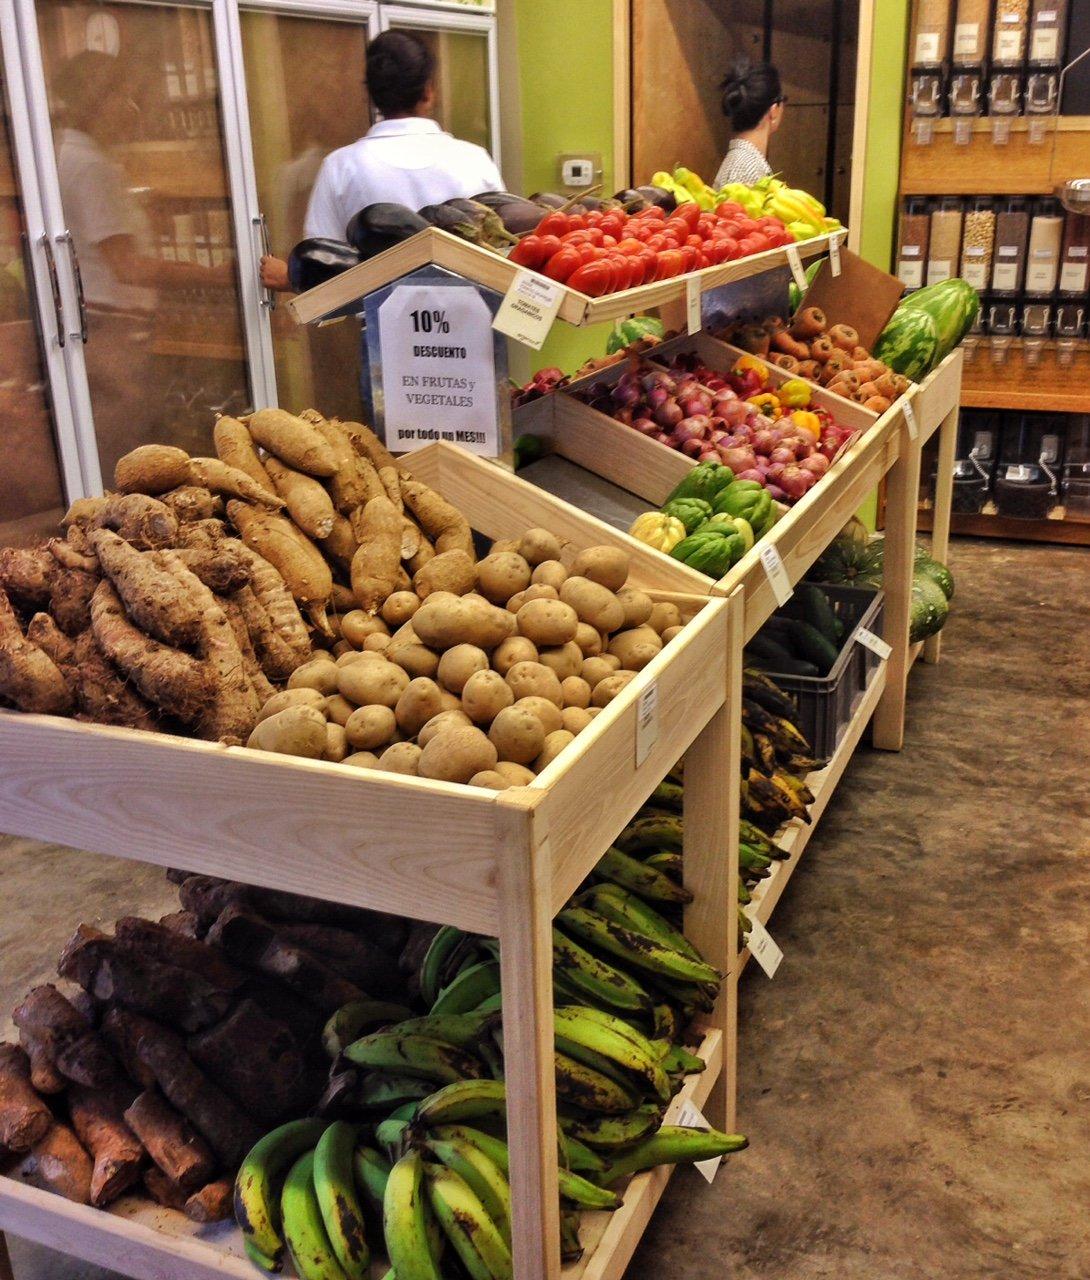 Mercado de productos orgánicos en la tienda Orgánica, Acrópolis Center